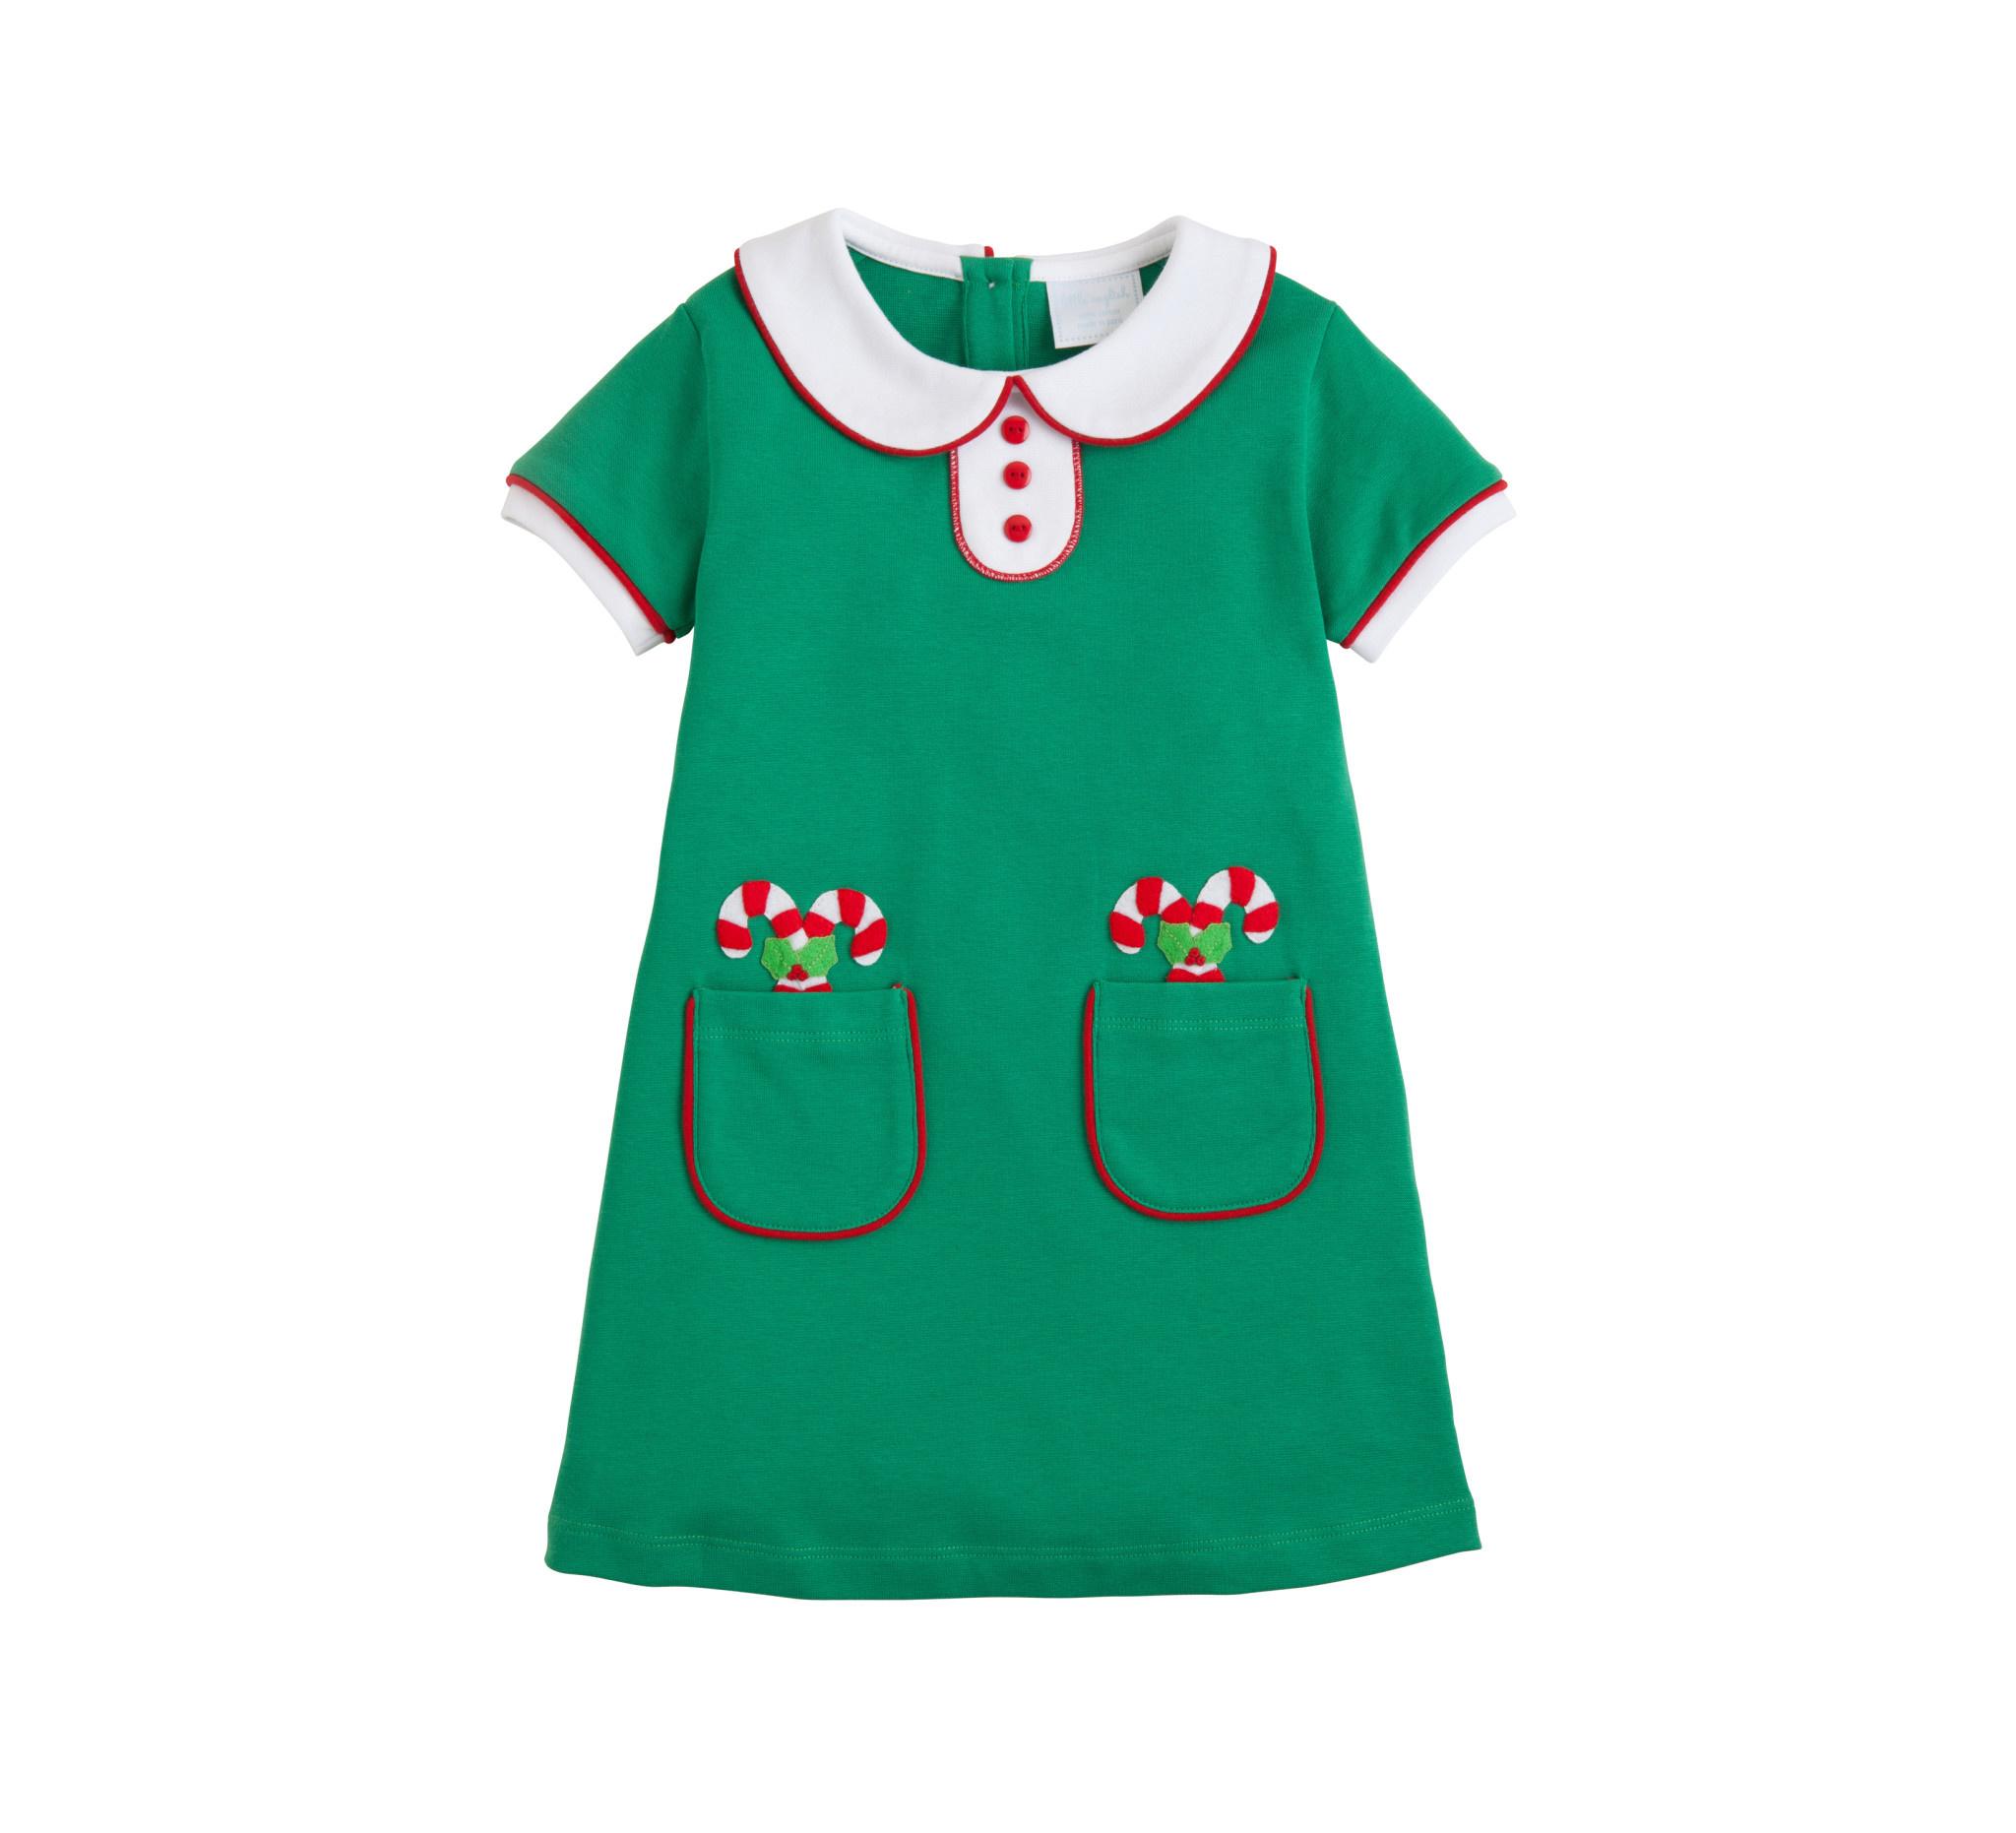 Little English Candy Cane Applique Dress